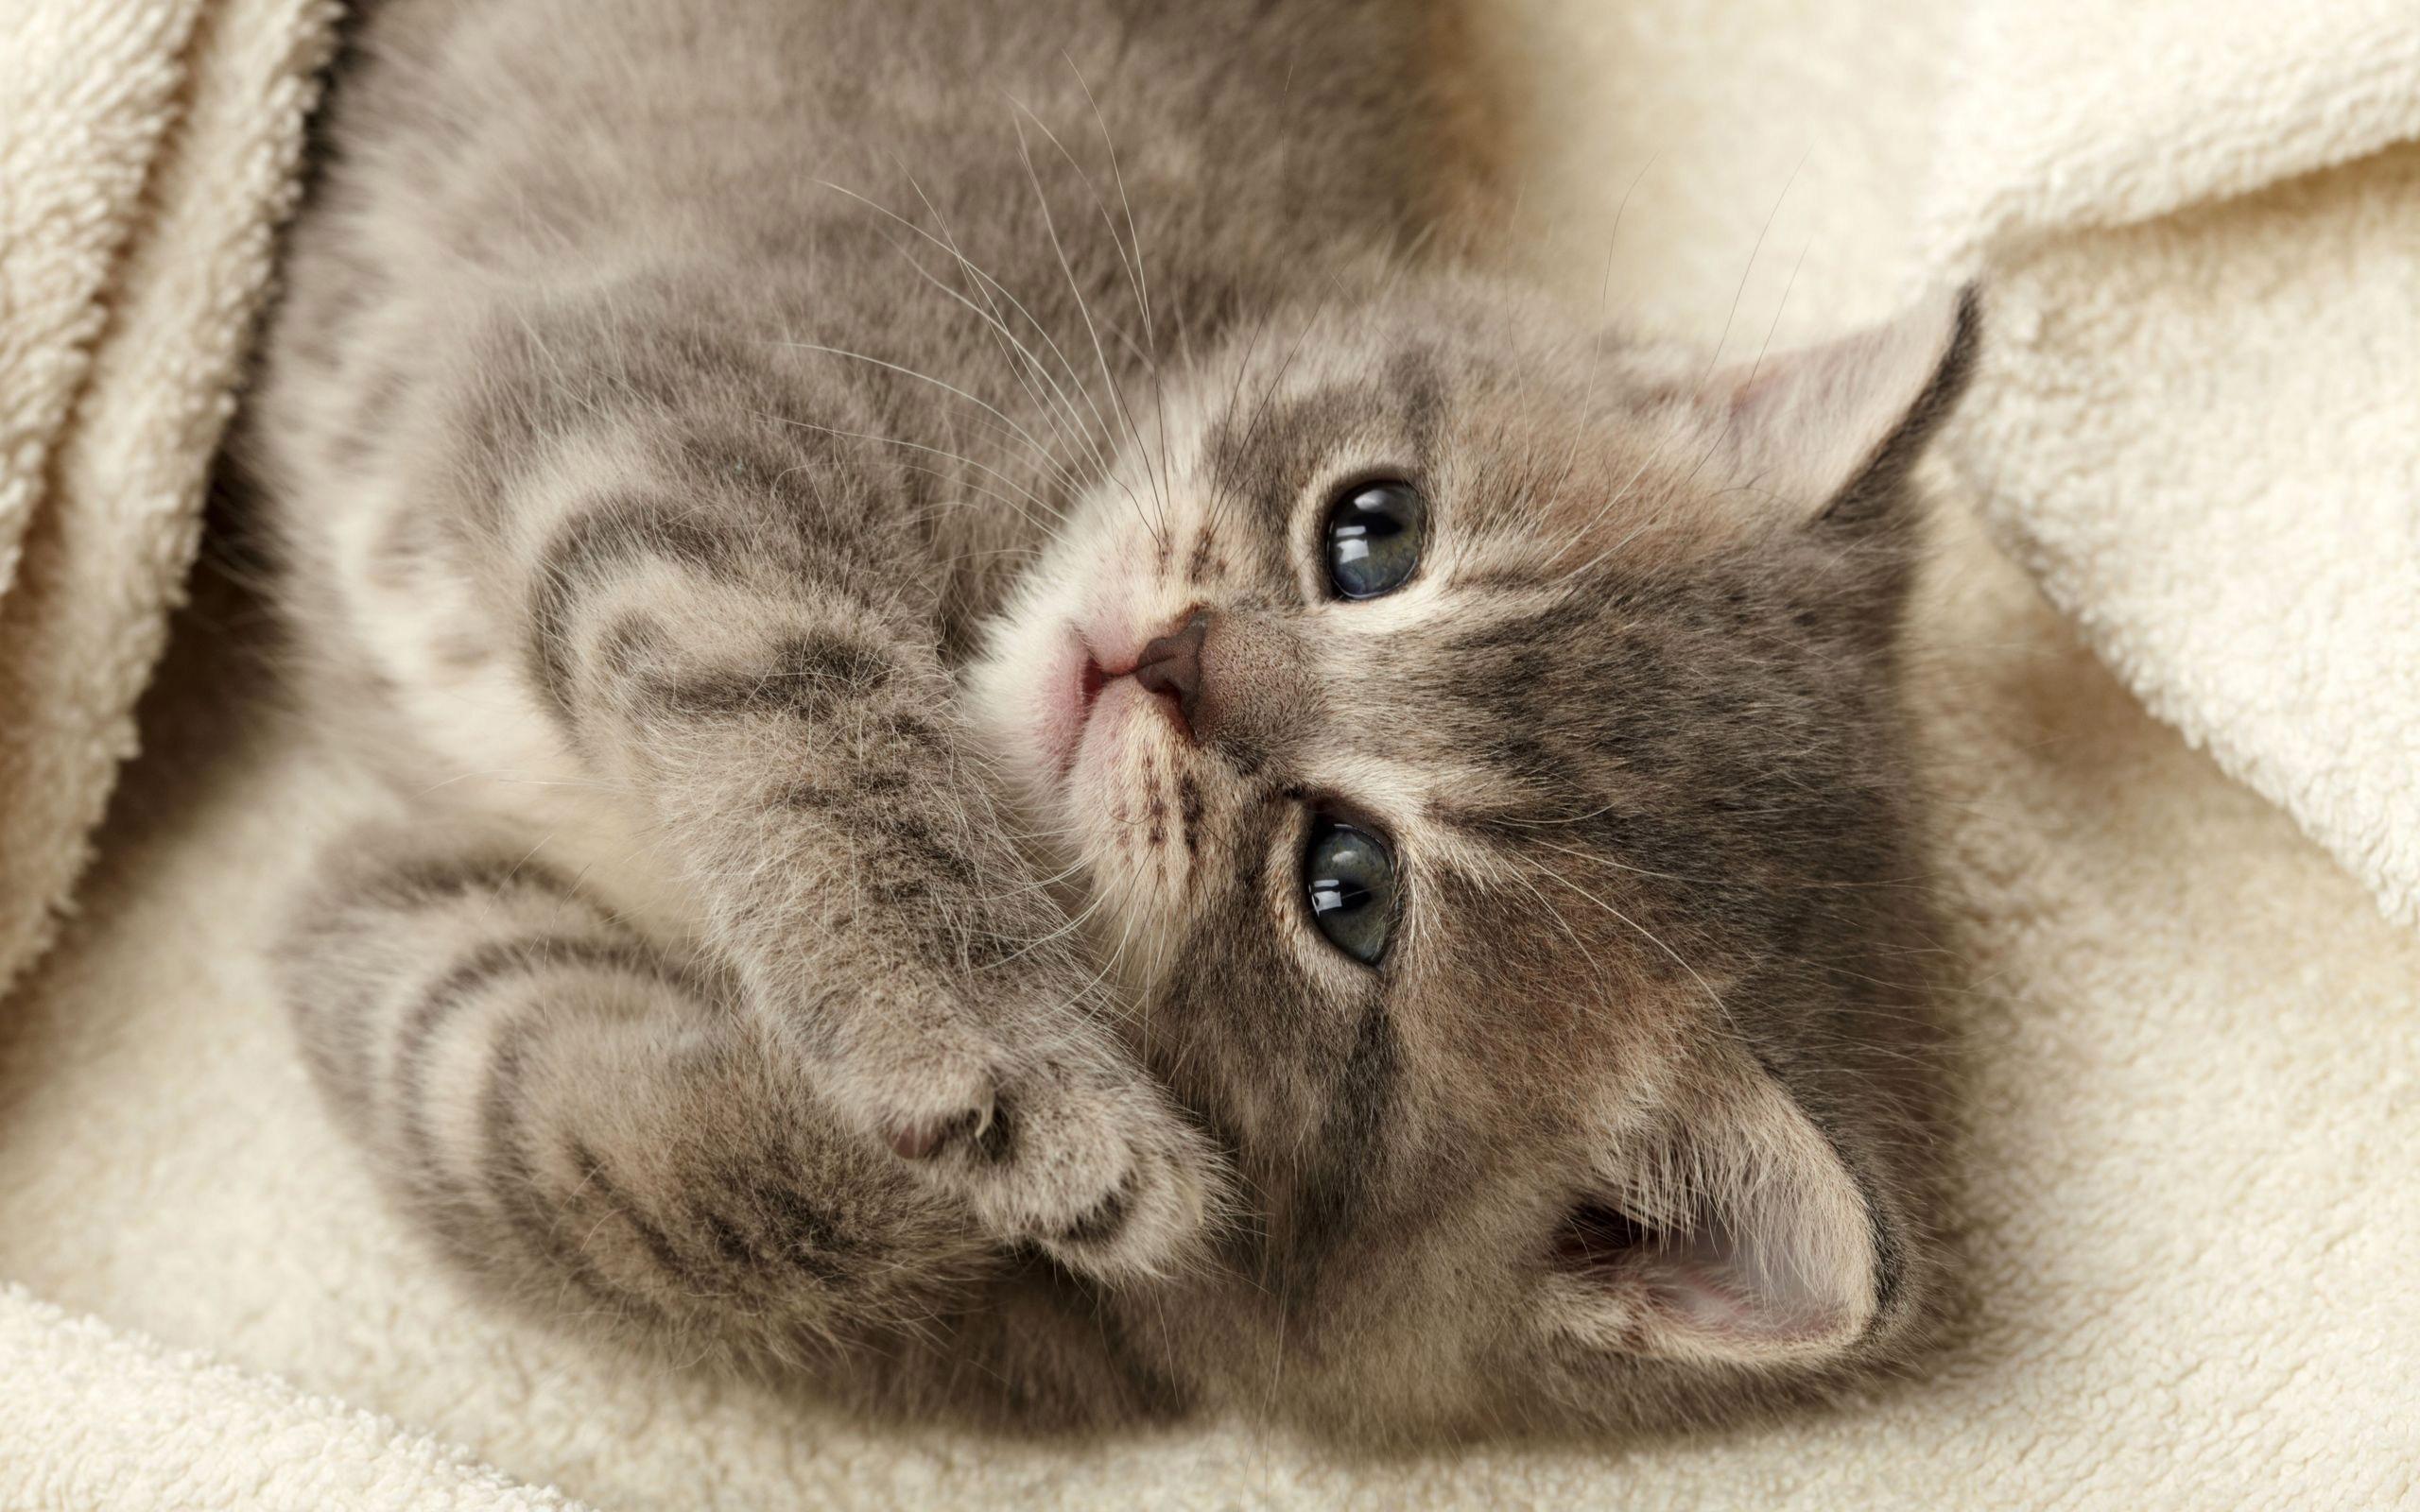 Обои на телефон котята красивые (18)